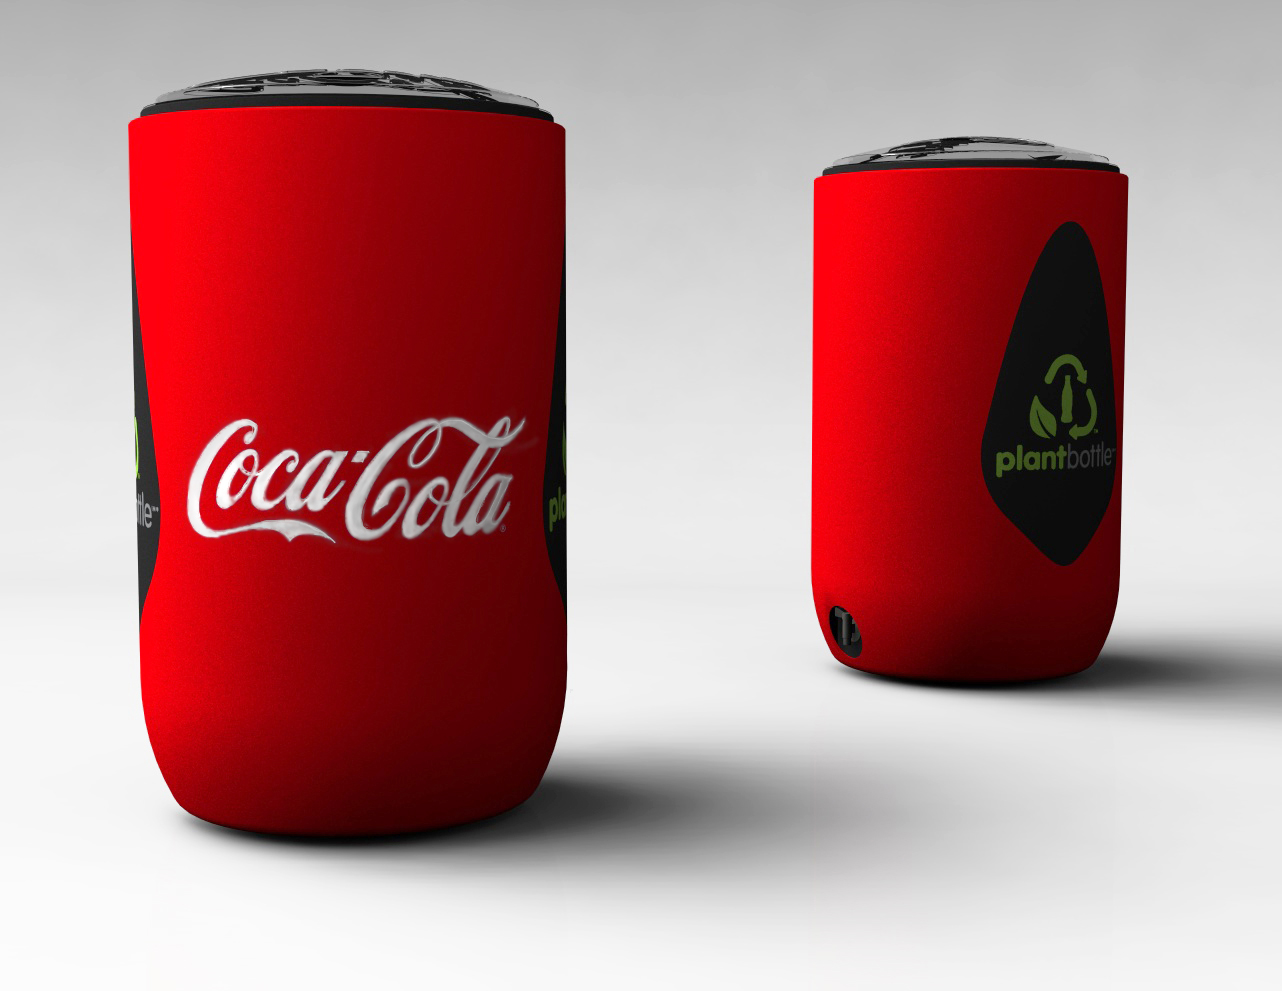 Coca-Cola ice barrel